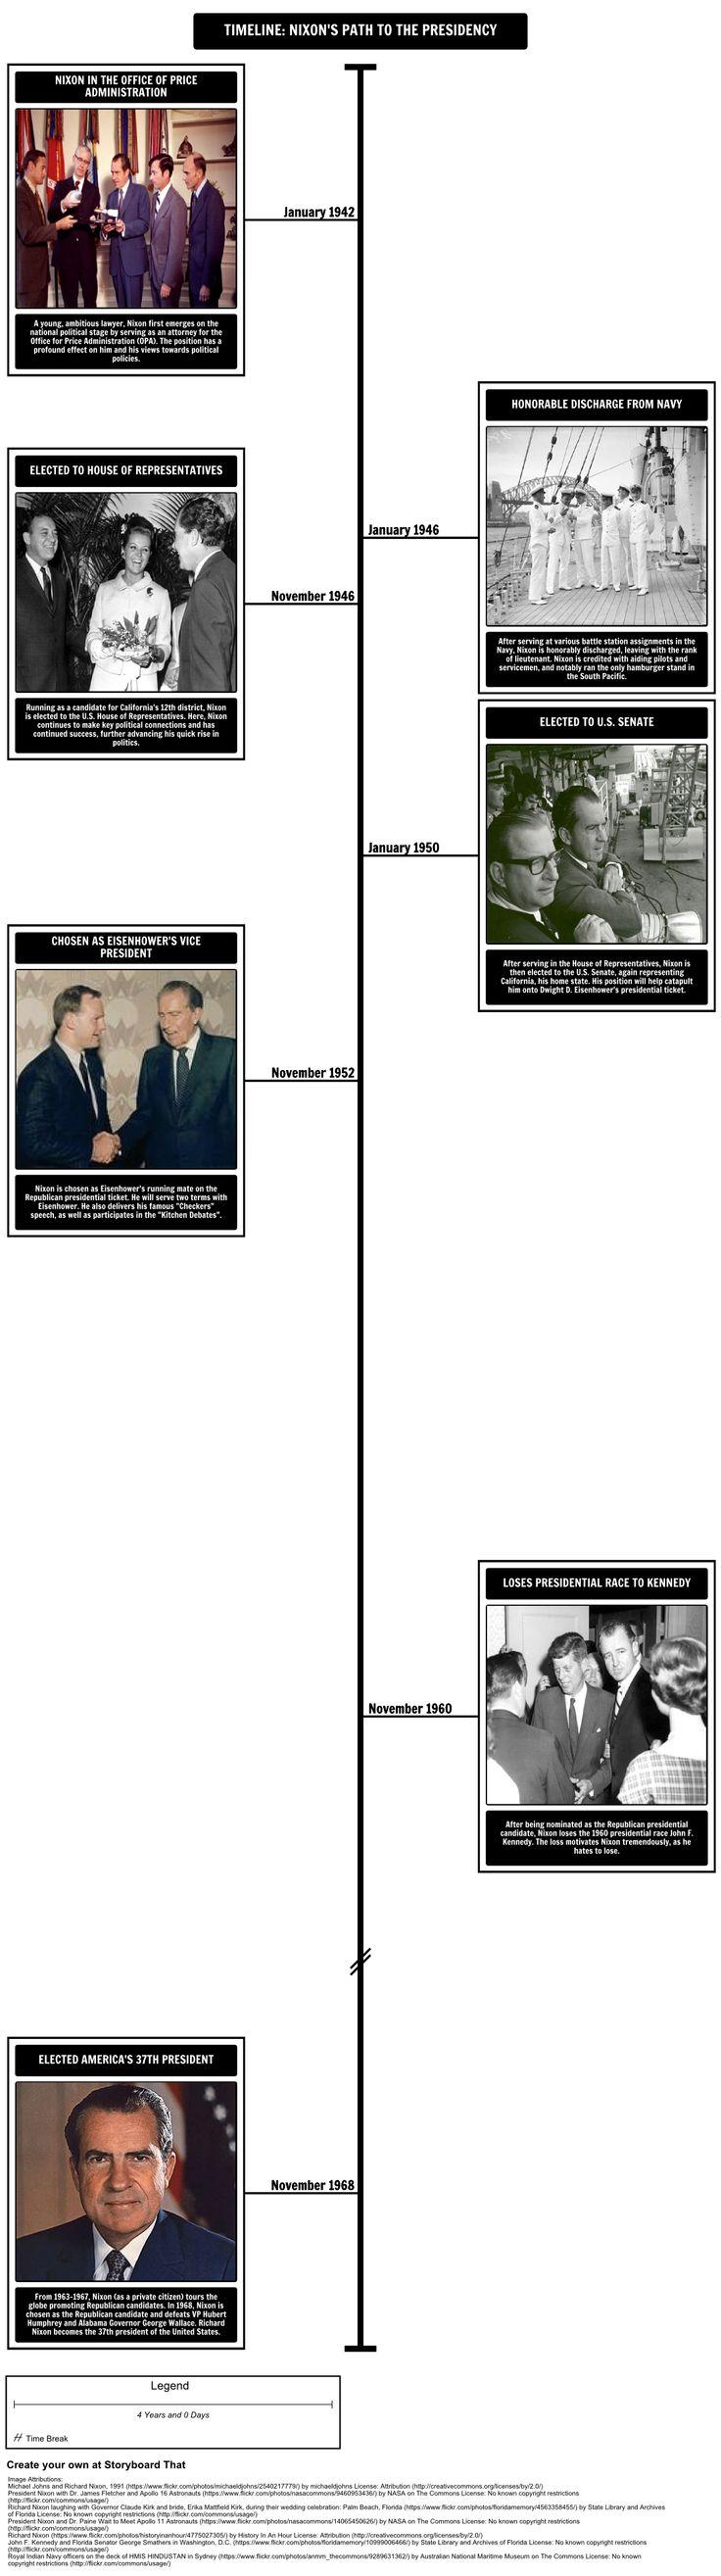 Richard Nixon - Path to the Presidency: Richard Nixon rose swiftly in the political sphere